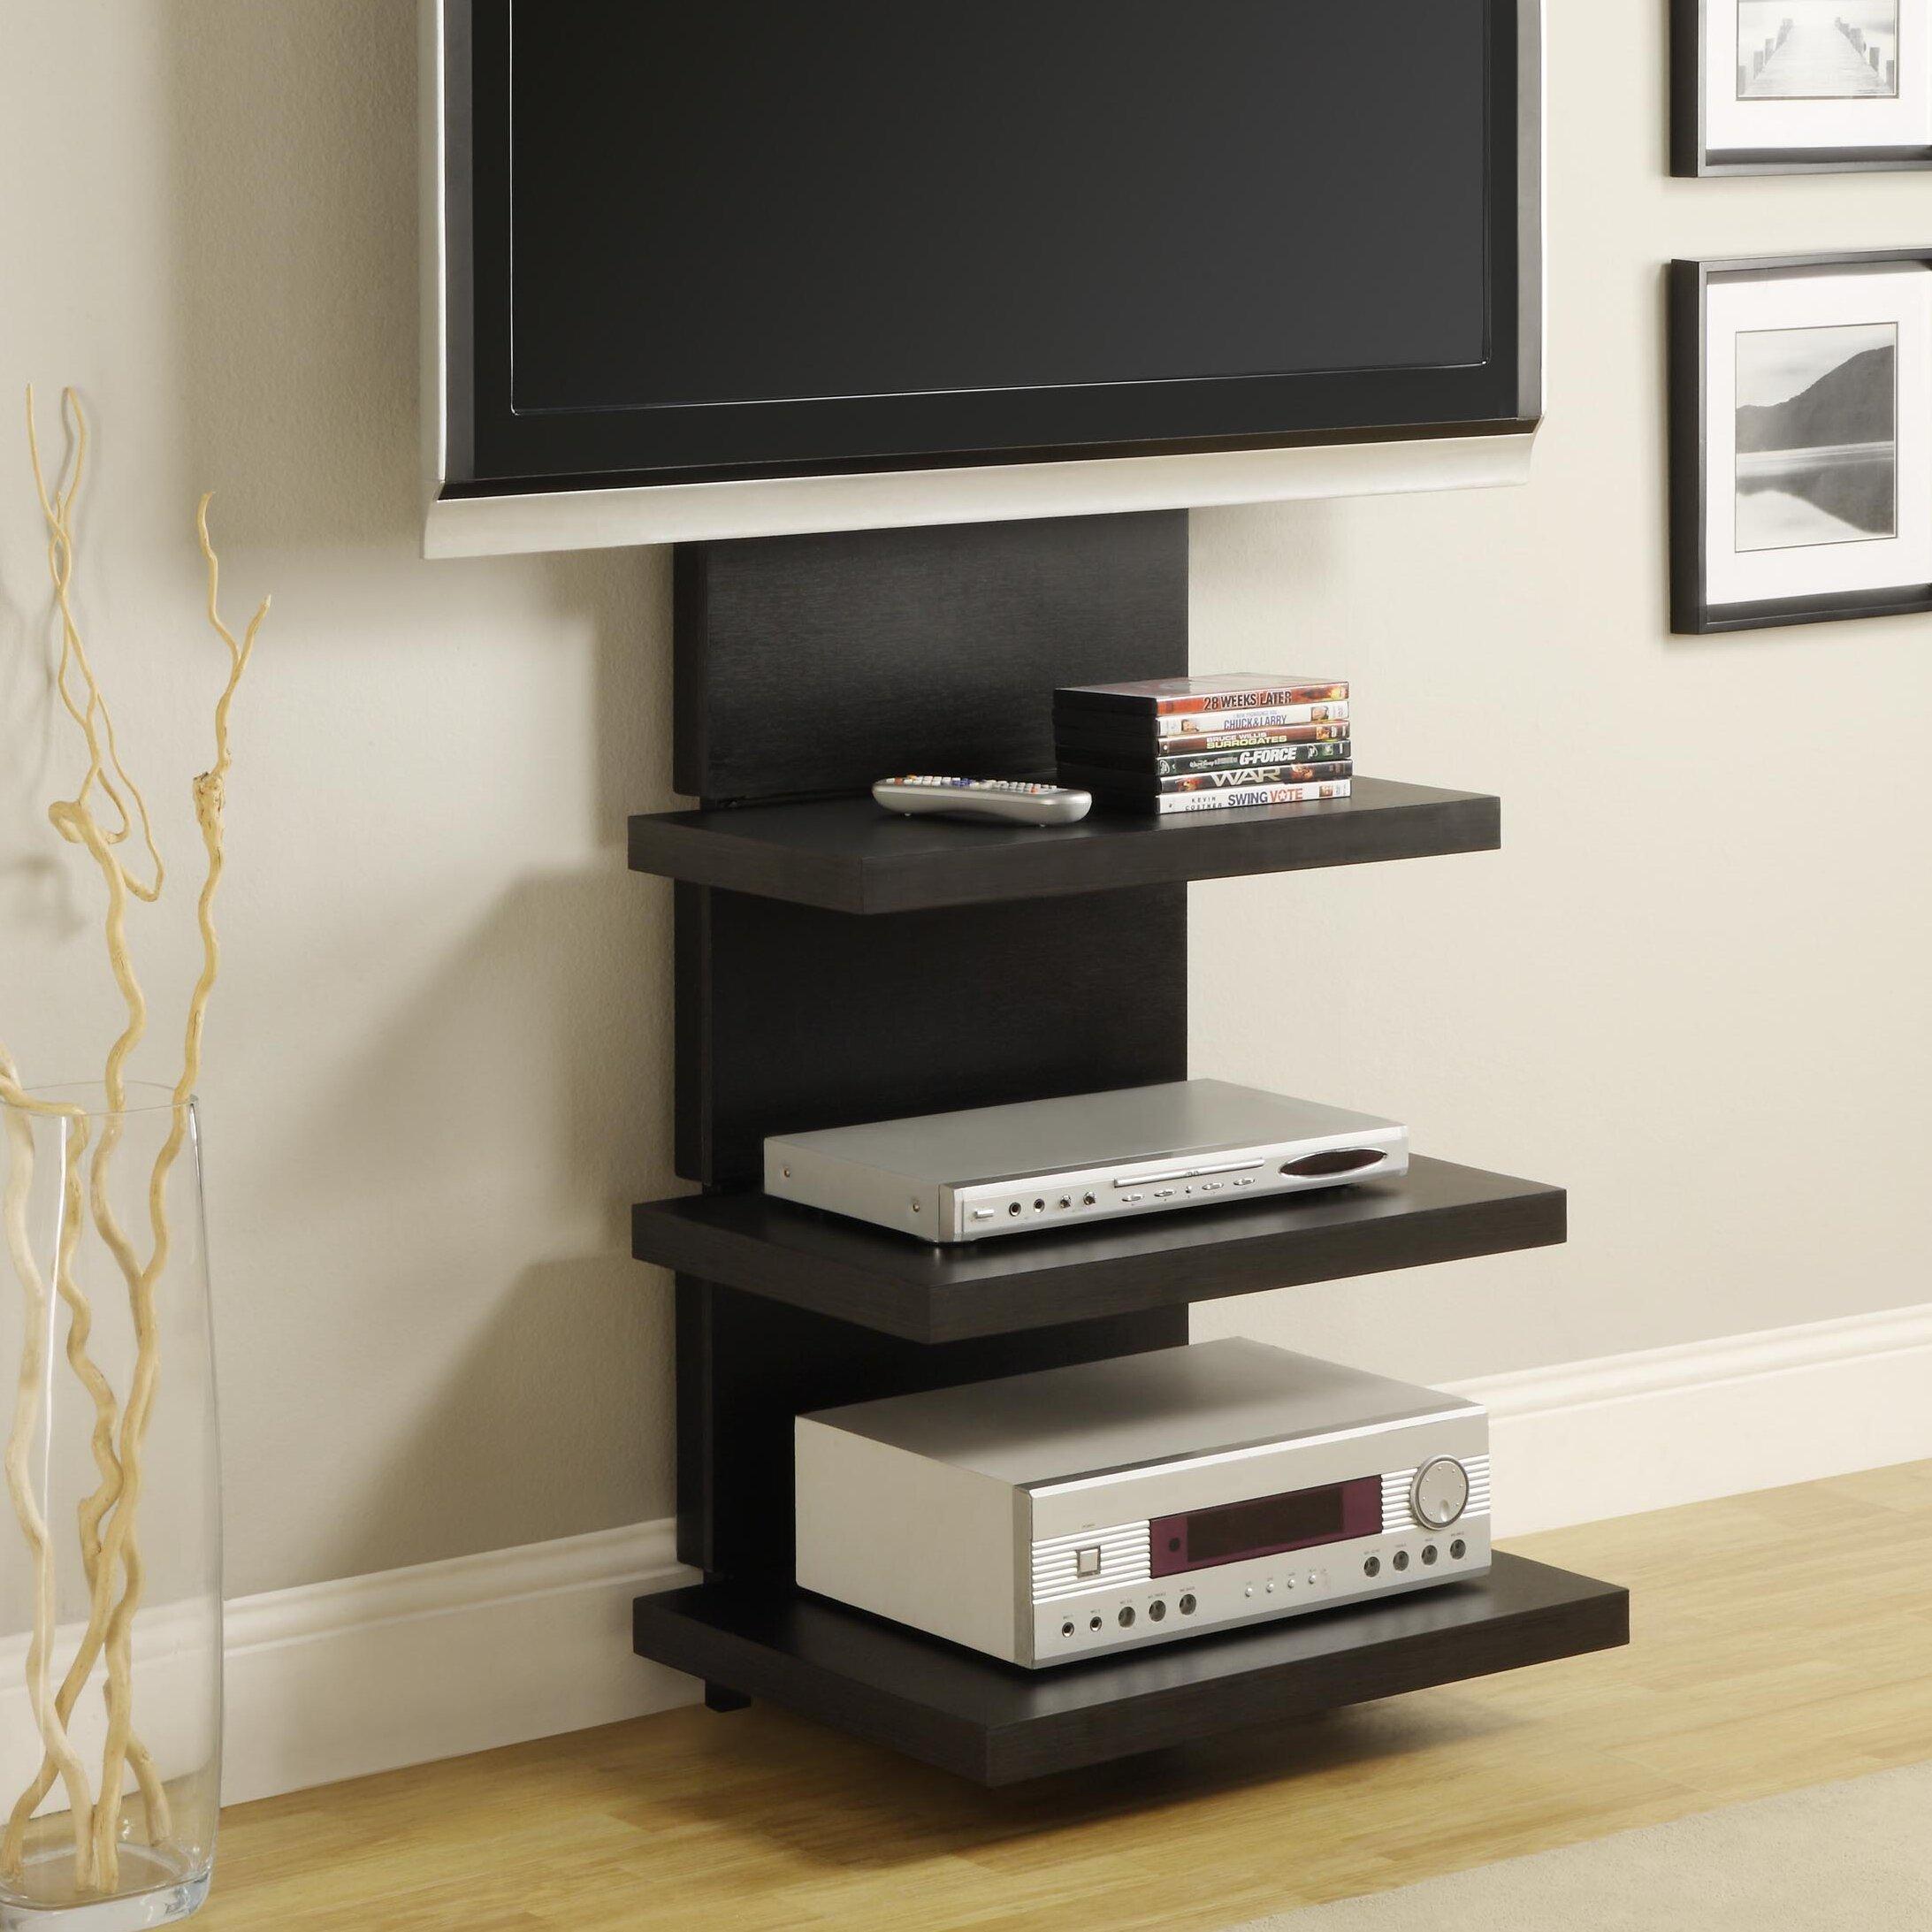 Zipcode design kayla tv stand reviews wayfair for Petite table tele